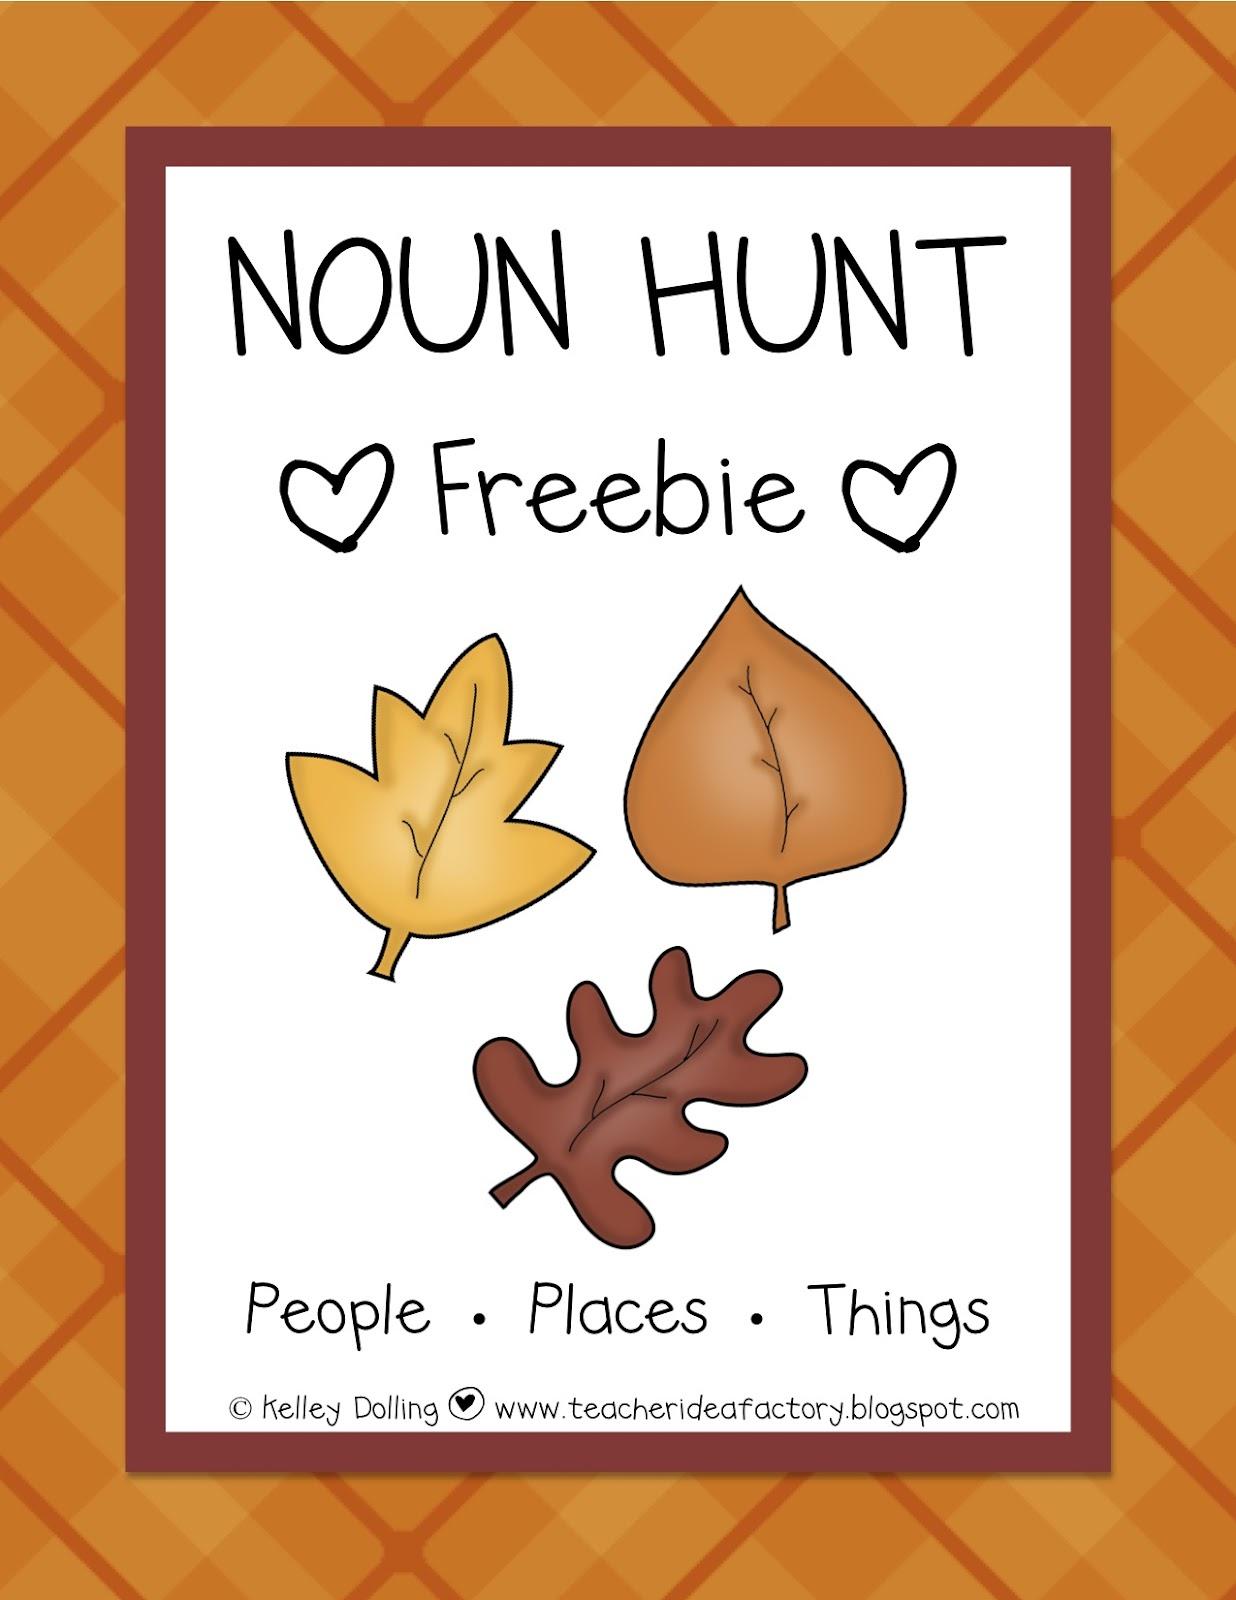 Noun Hunt Freebie The Latest Haps